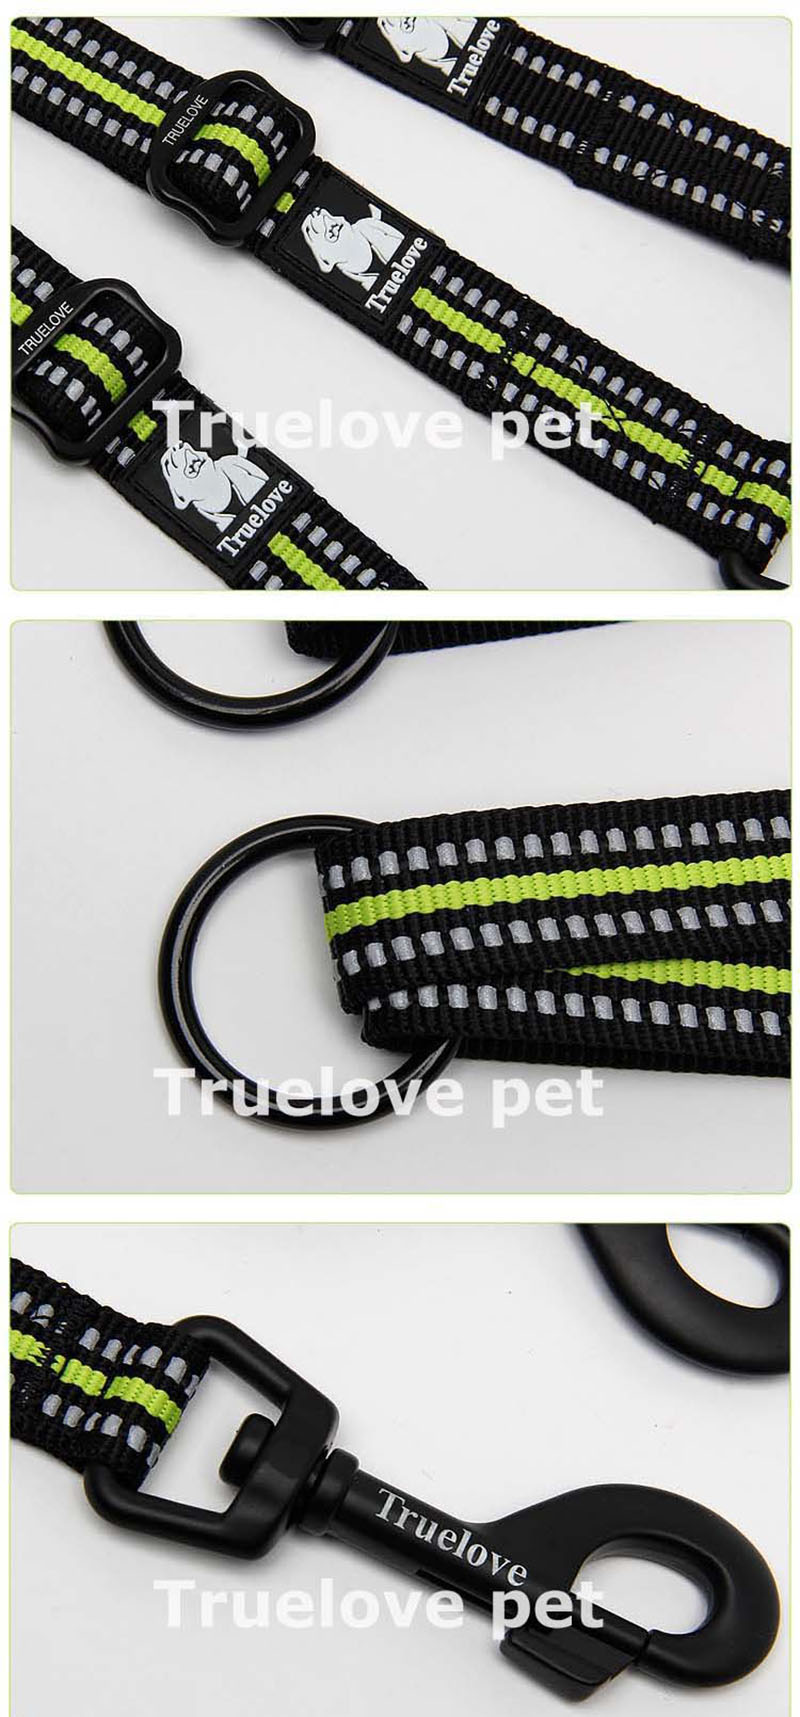 Truelove 3M Reflective Hands Free  Smart Double Dog Leash (8)